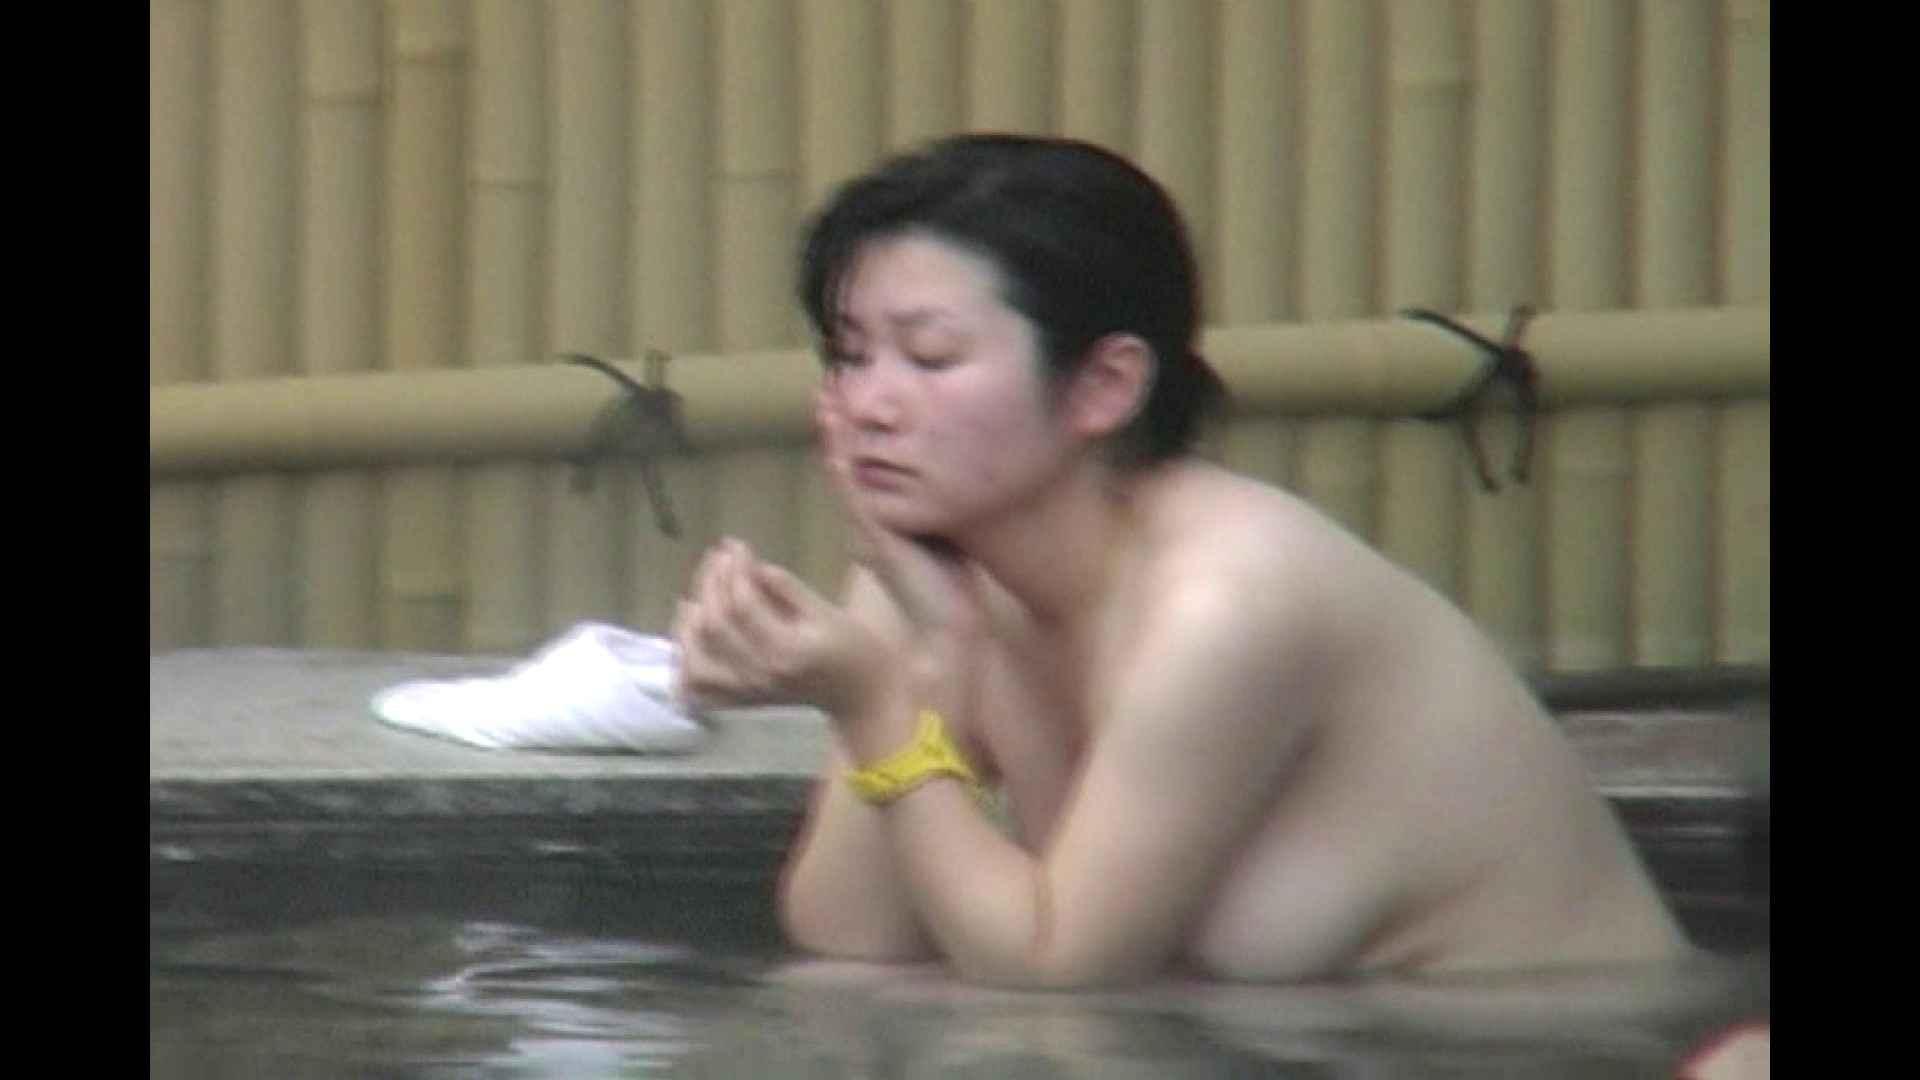 Aquaな露天風呂Vol.545 0 | 0  33連発 11